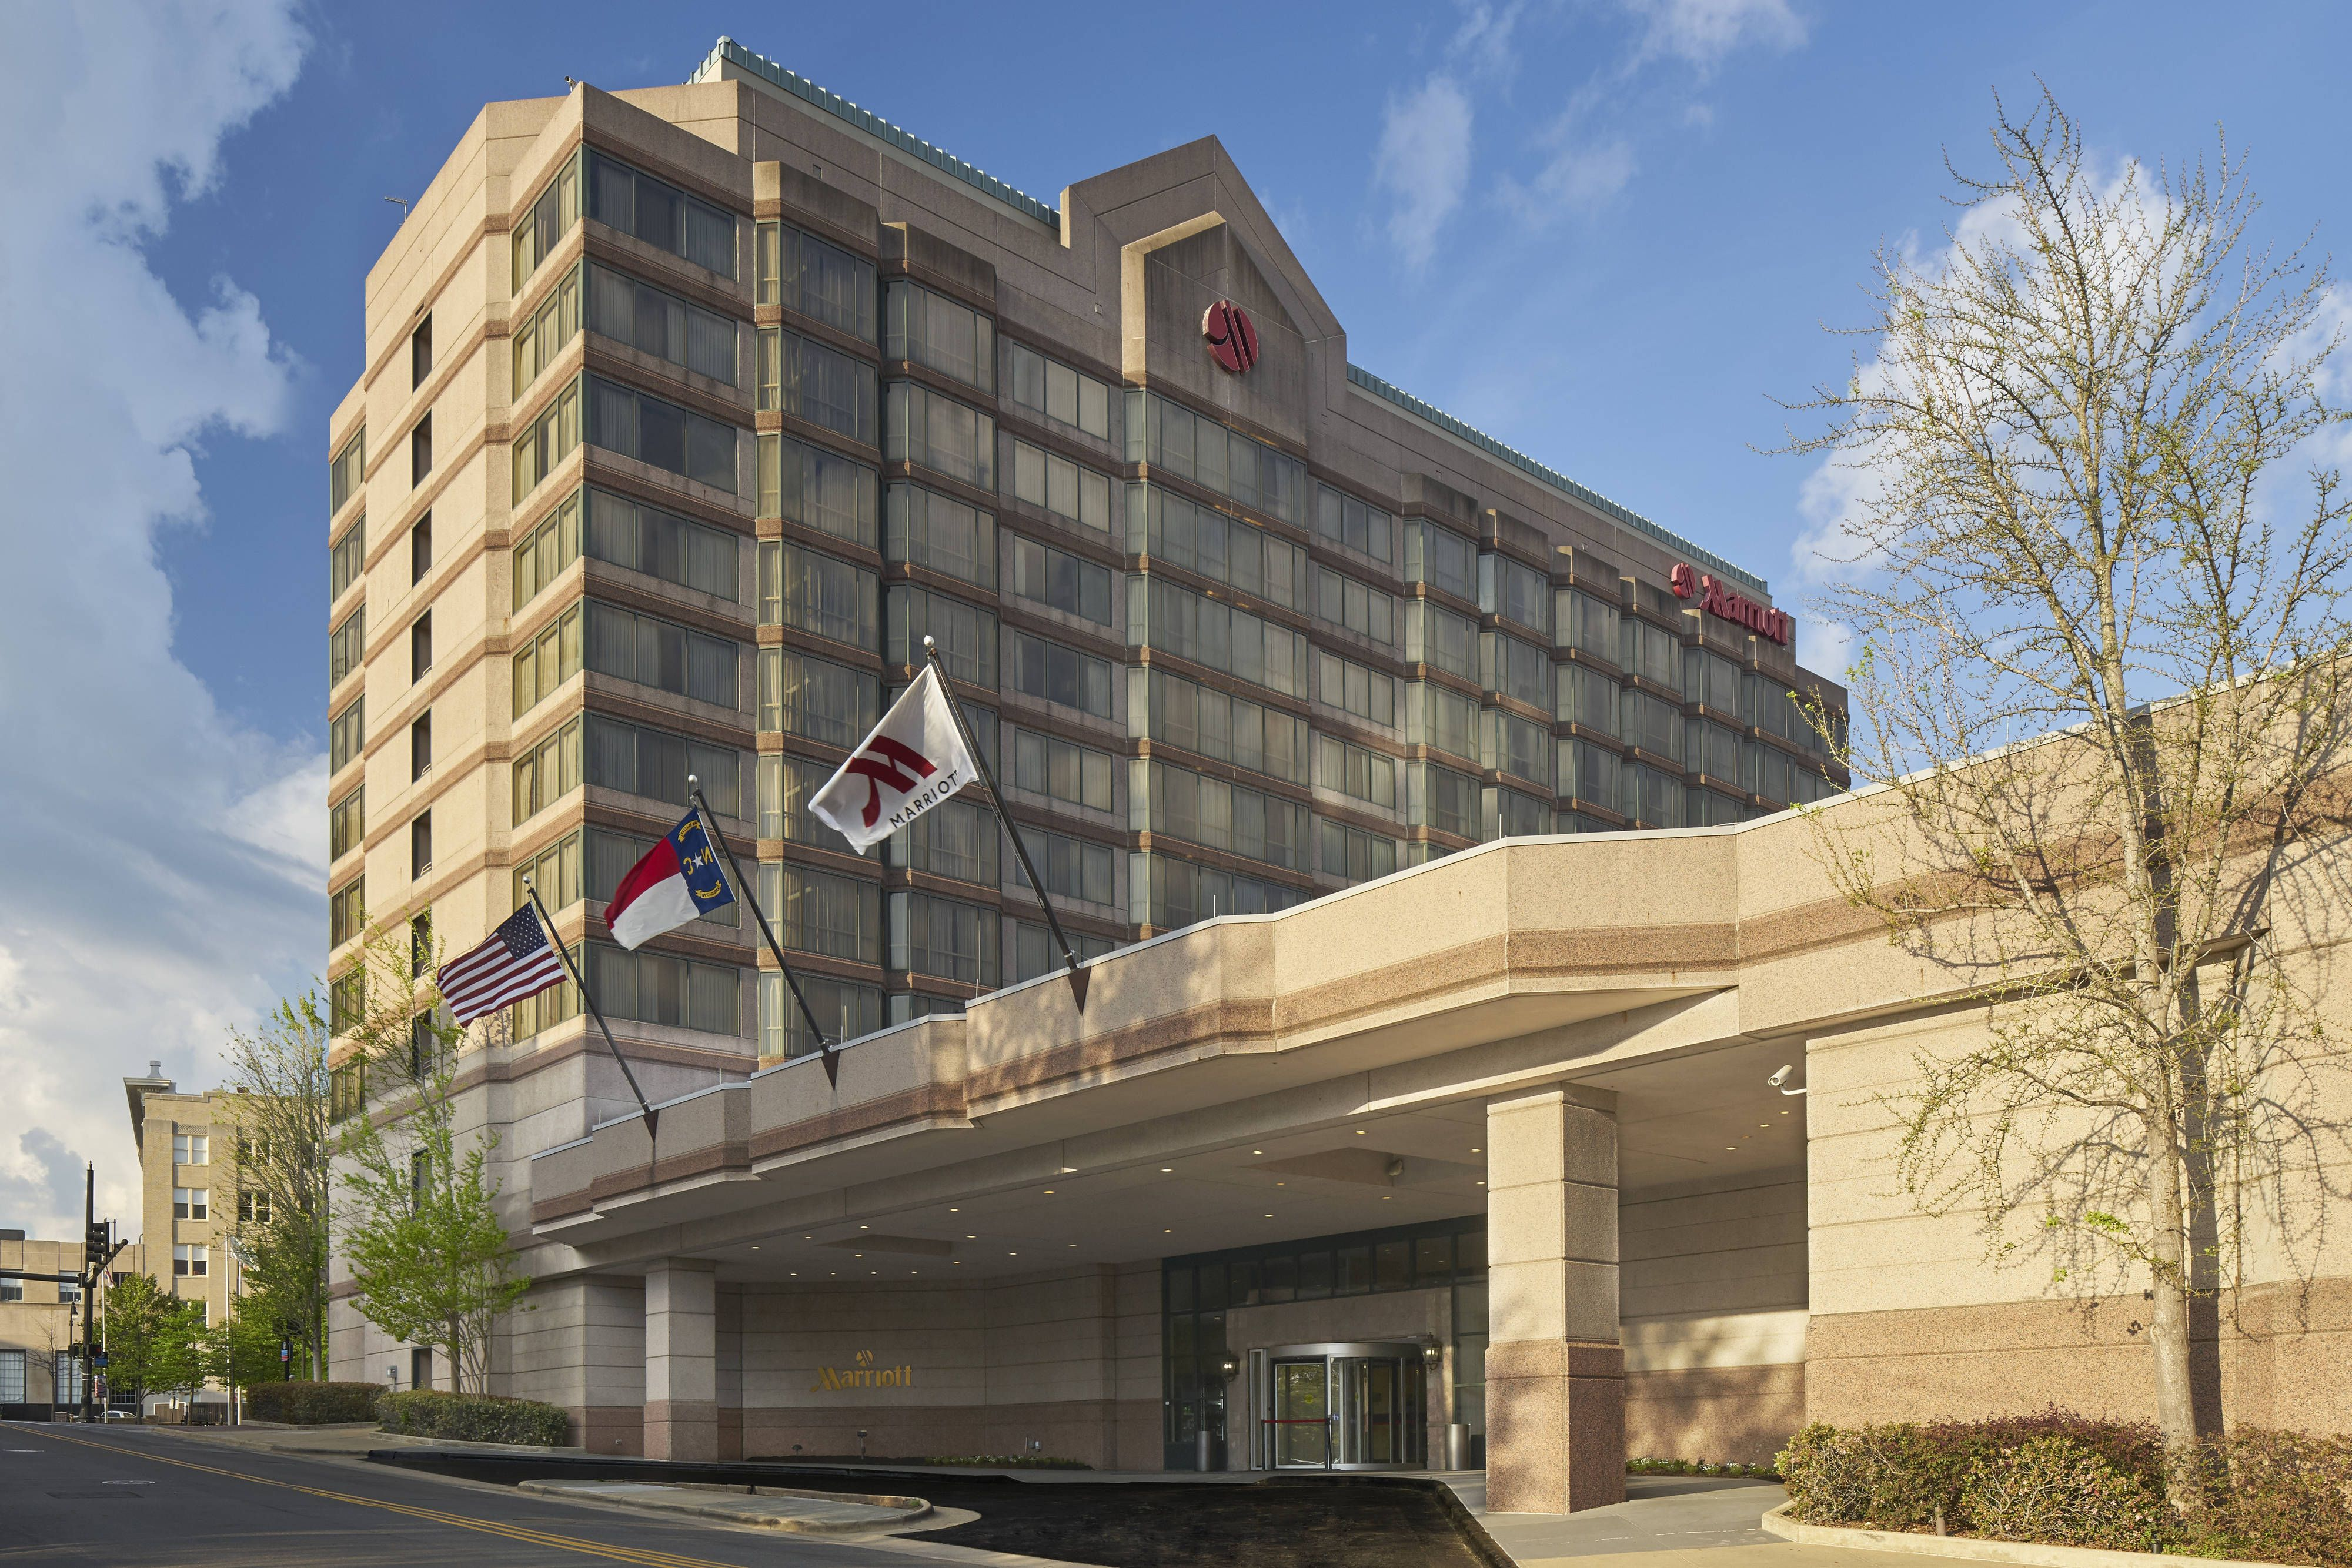 Durham Marriott City Center Exterior Holidays Beautiful Hotels